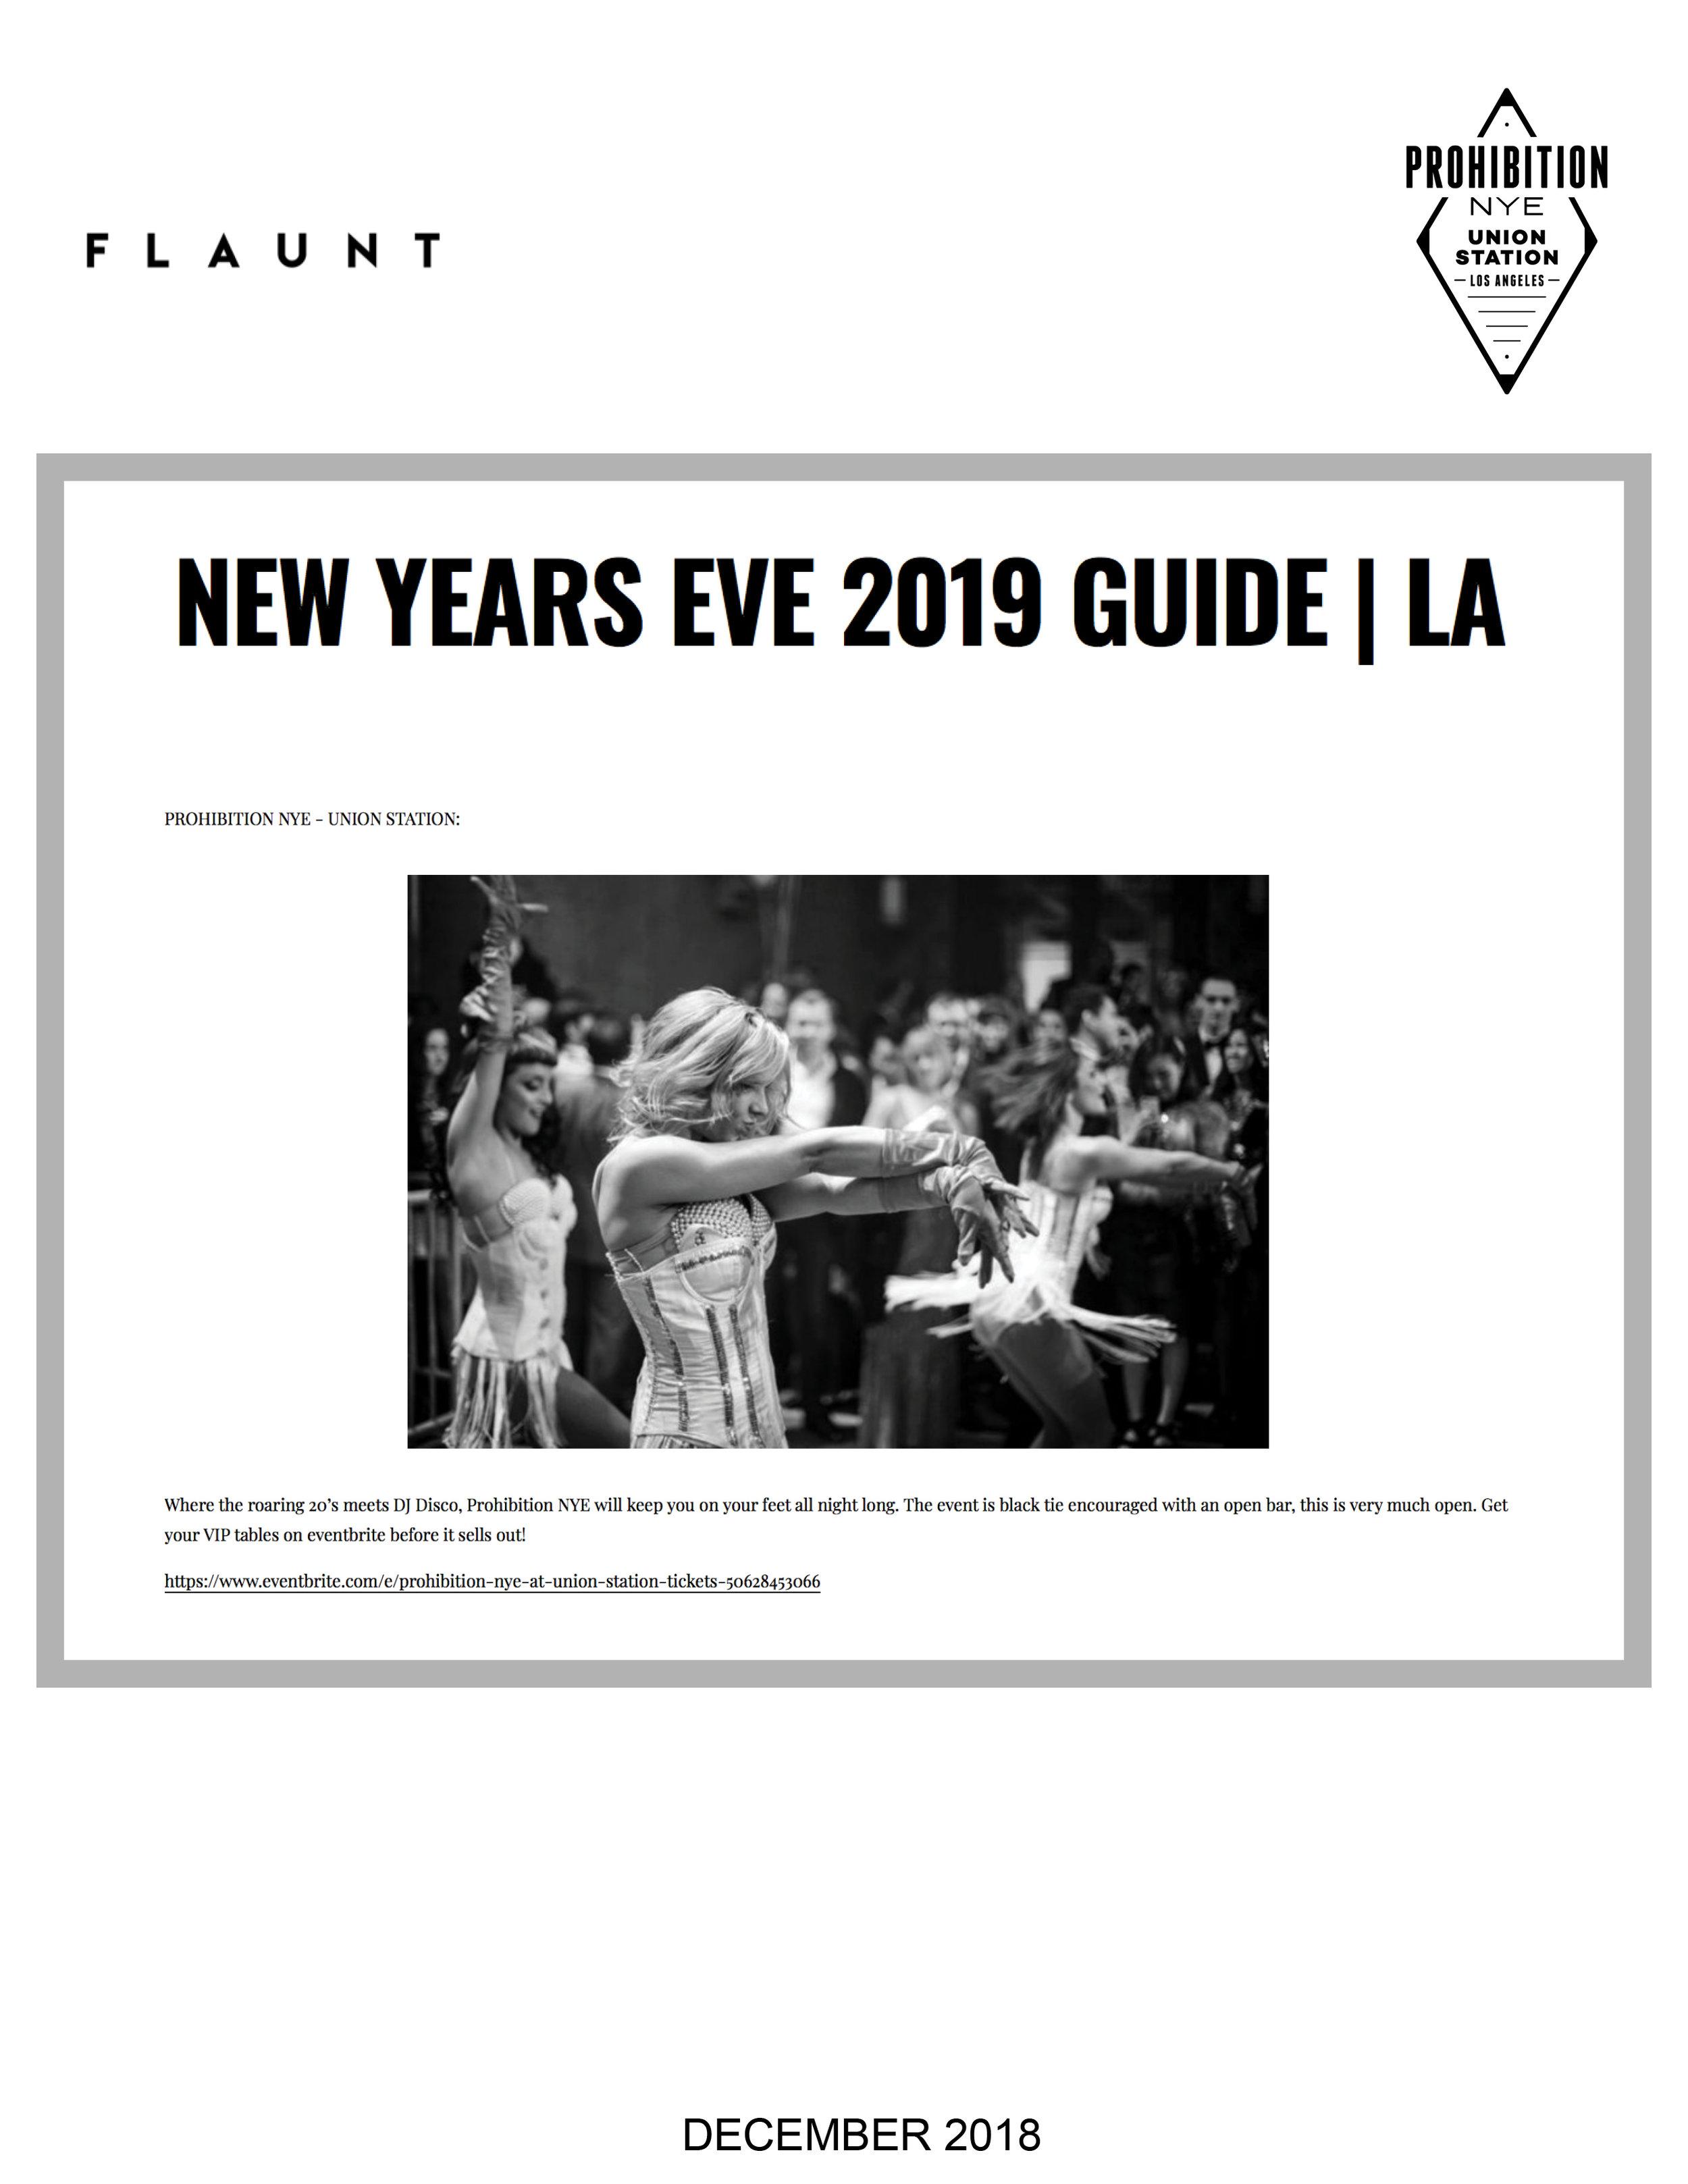 ProhibitionNYE_FlauntMagazine_December2018.jpg